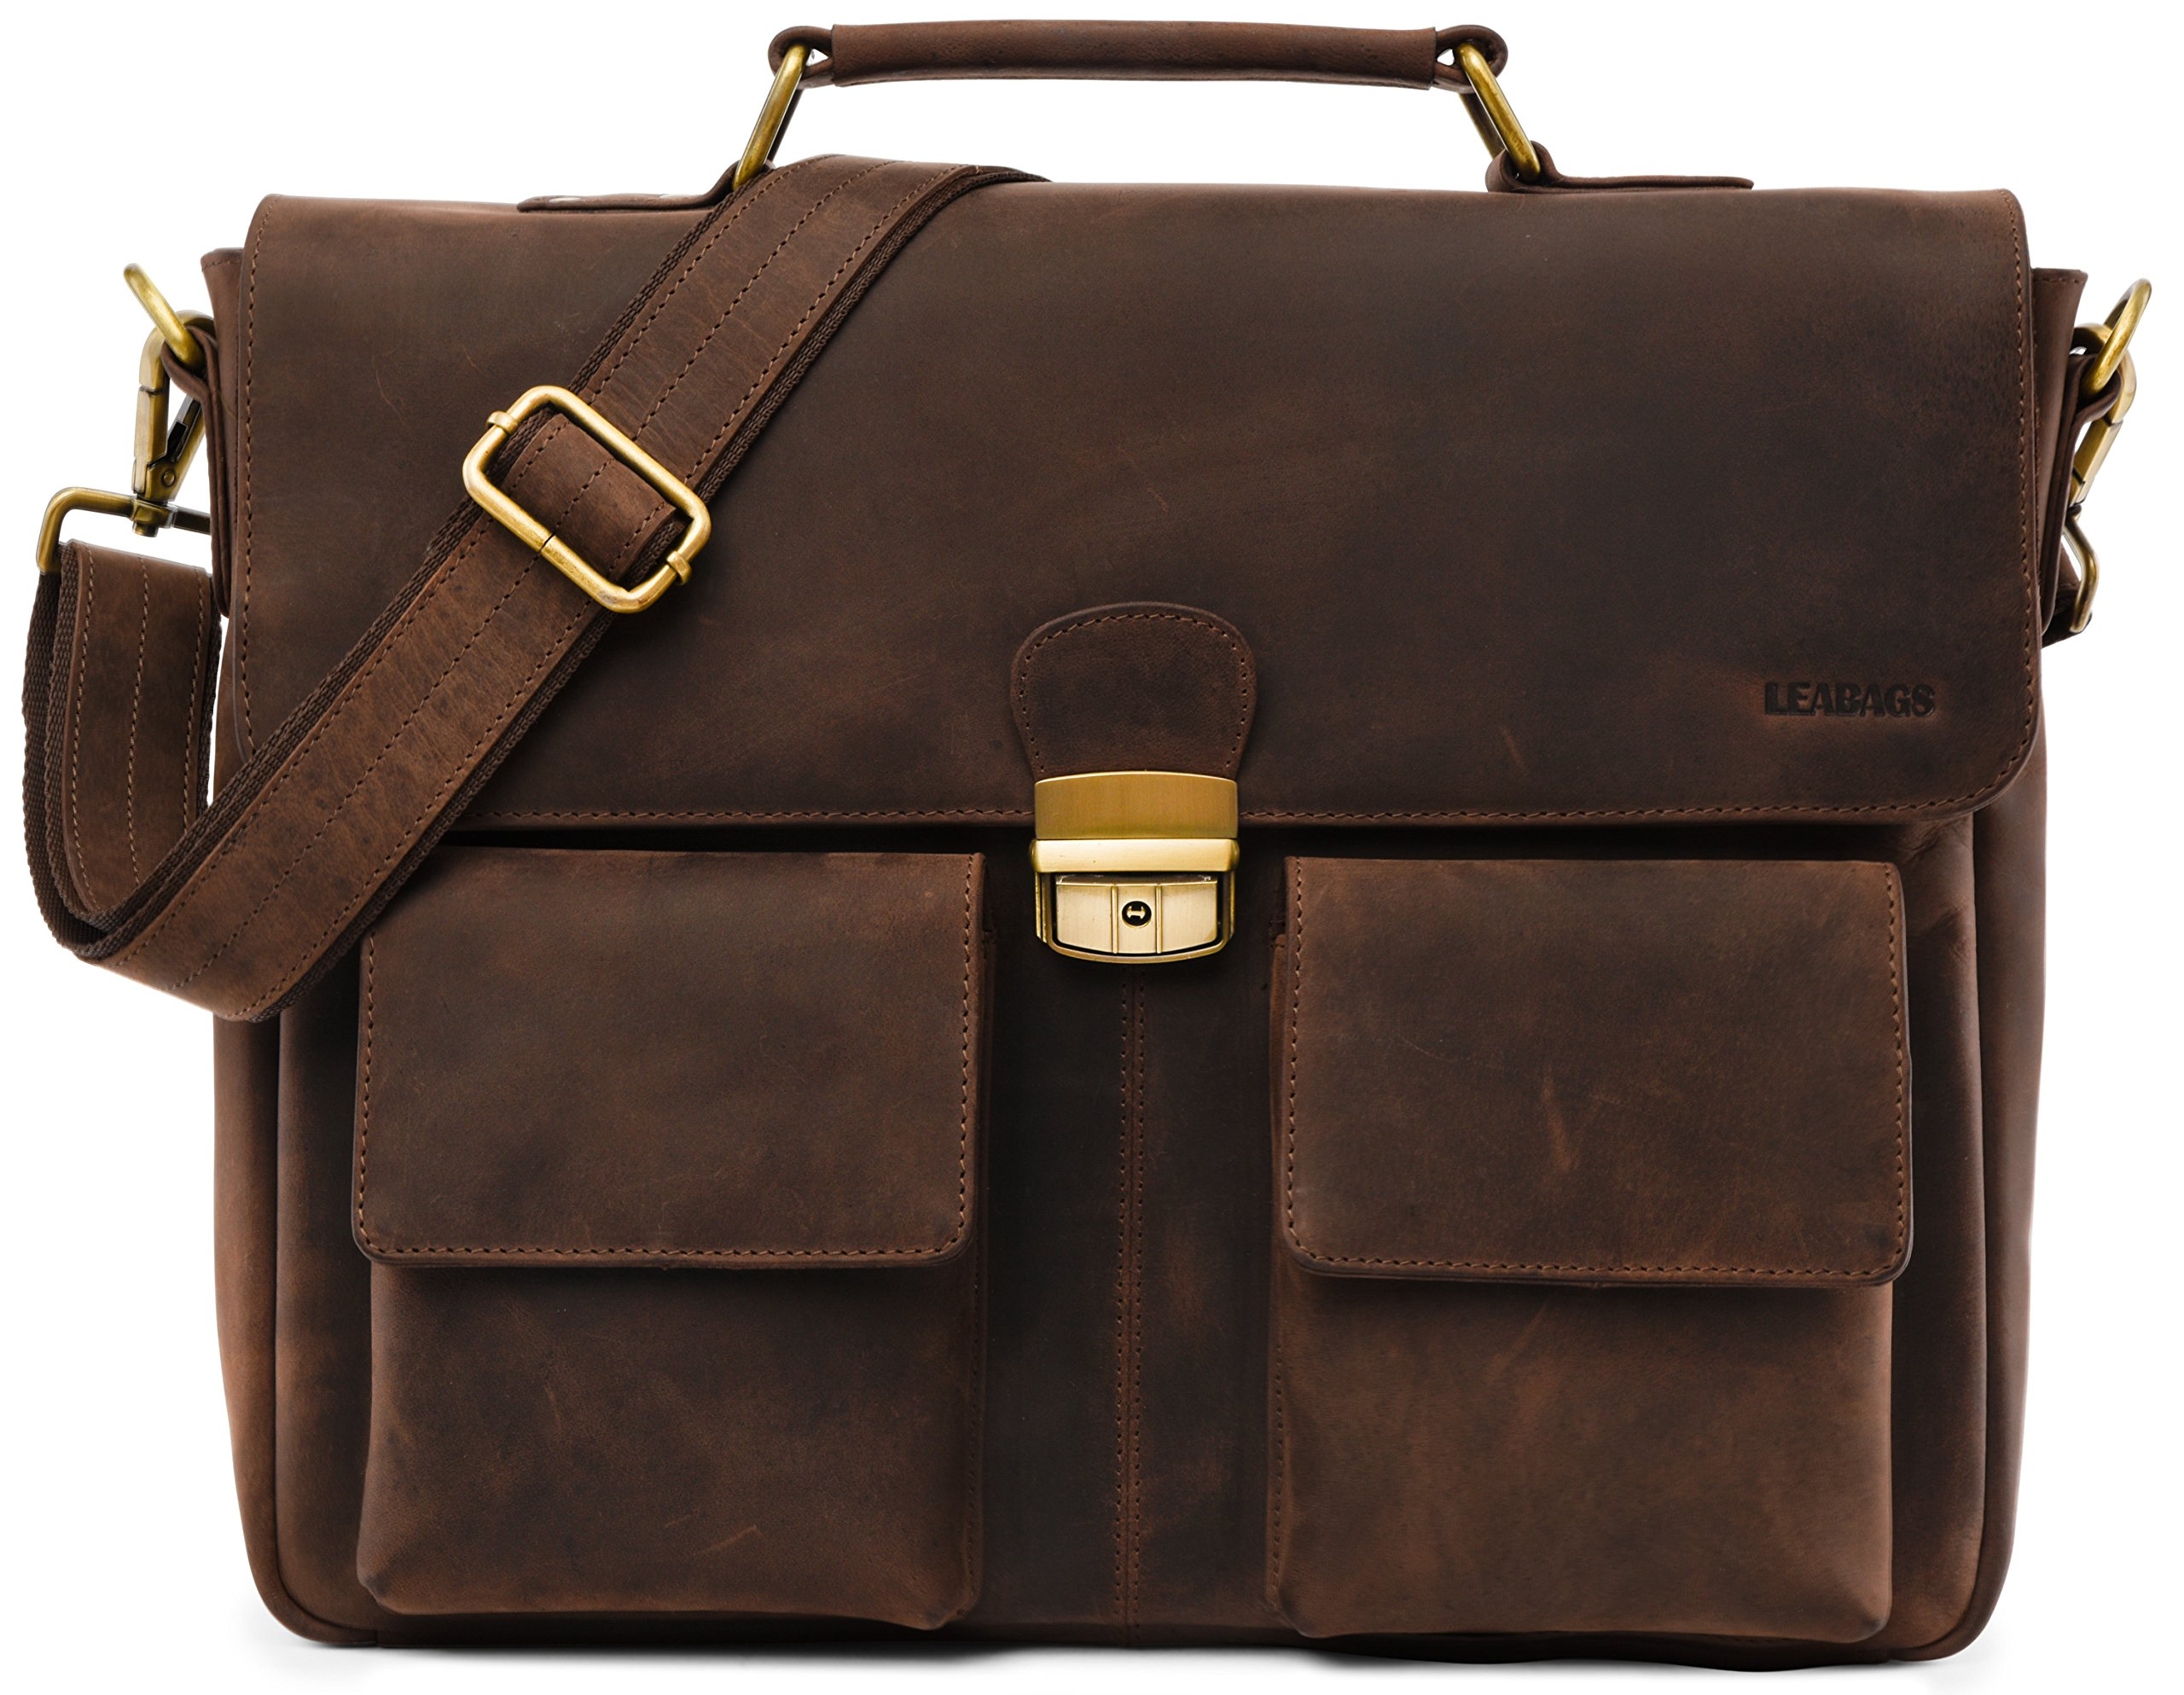 LEABAGS Lisburn Briefcase made of Genuine Leather in Vintage Look - Muskat